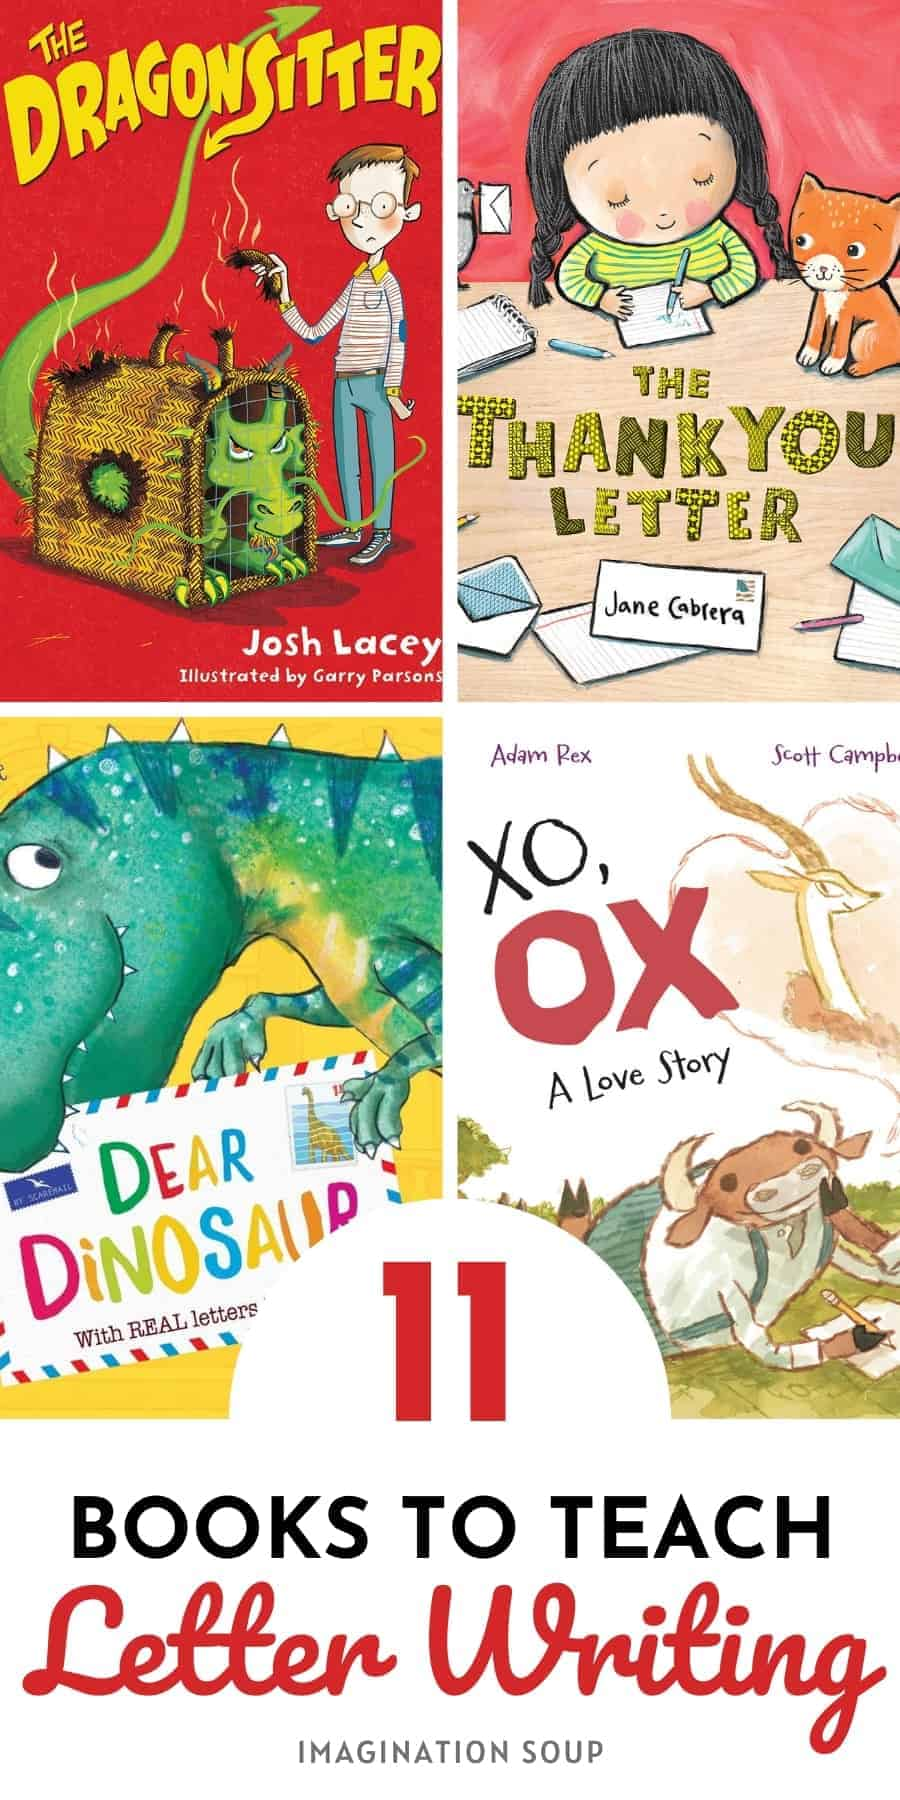 Children's Books to Teach Letter Writing